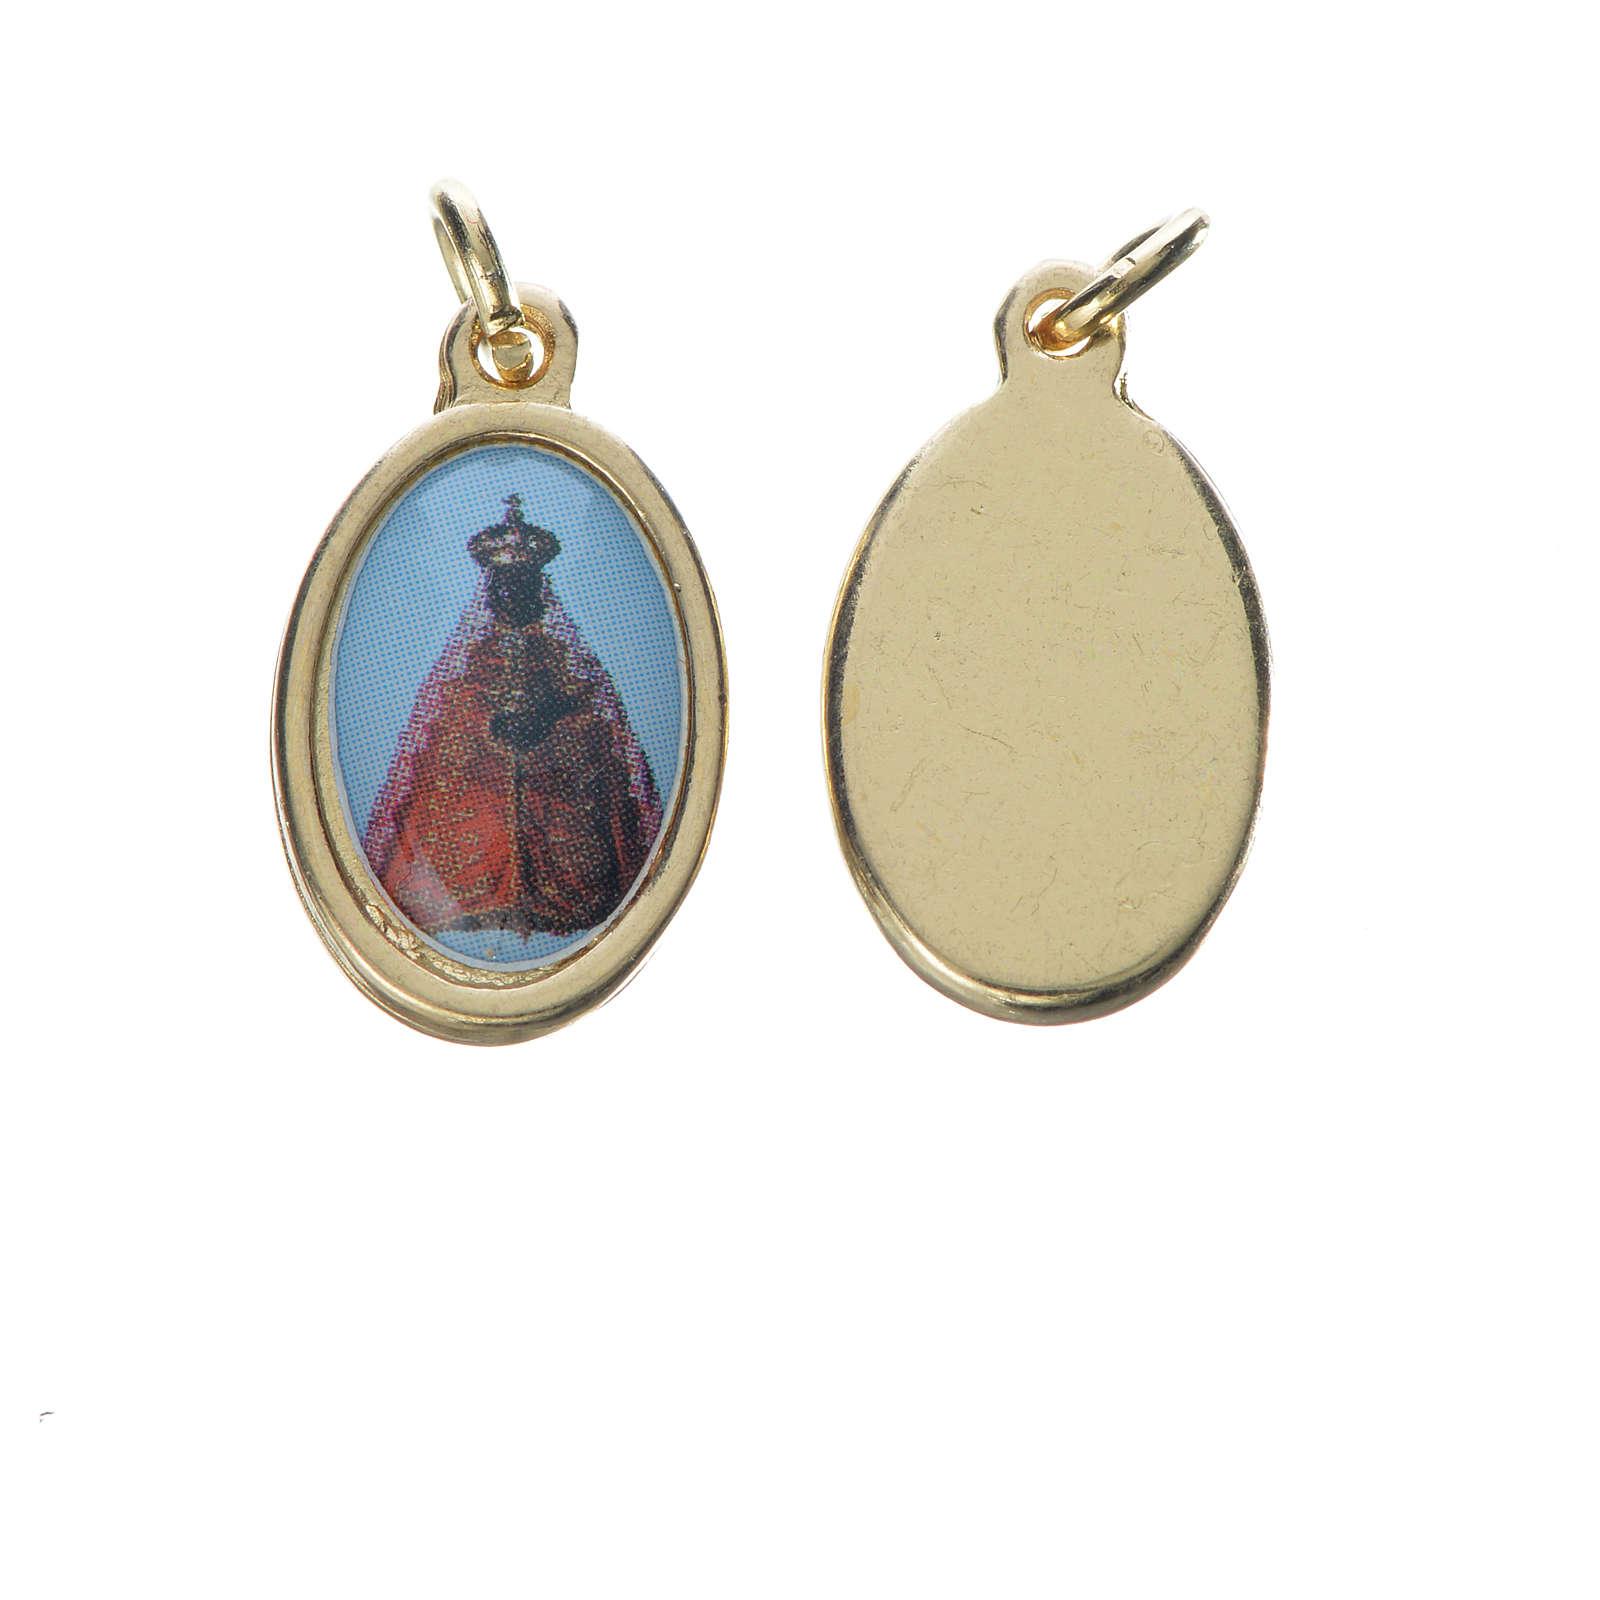 Black Virgin medal in golden metal, 1.5cm 4